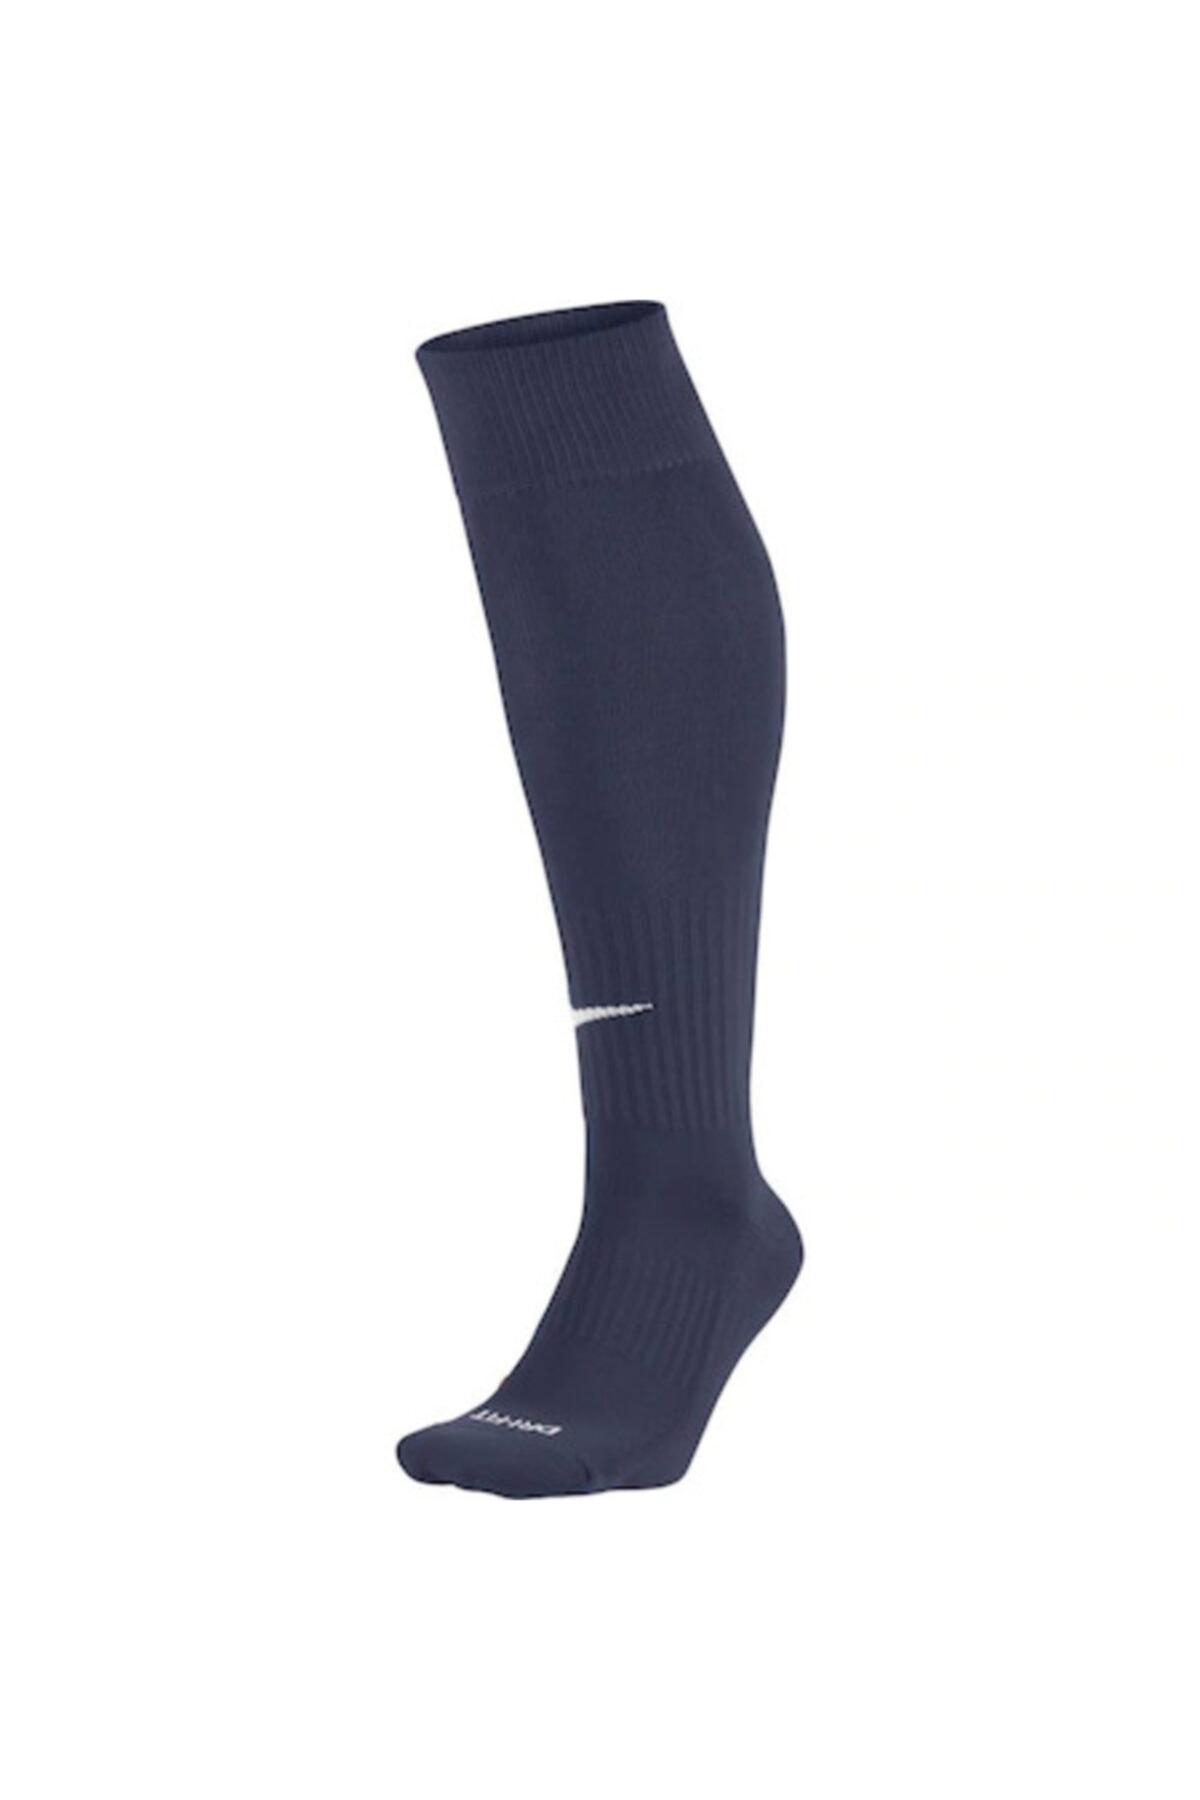 Dri-fit Futbol Çorabı 42-46 Numara